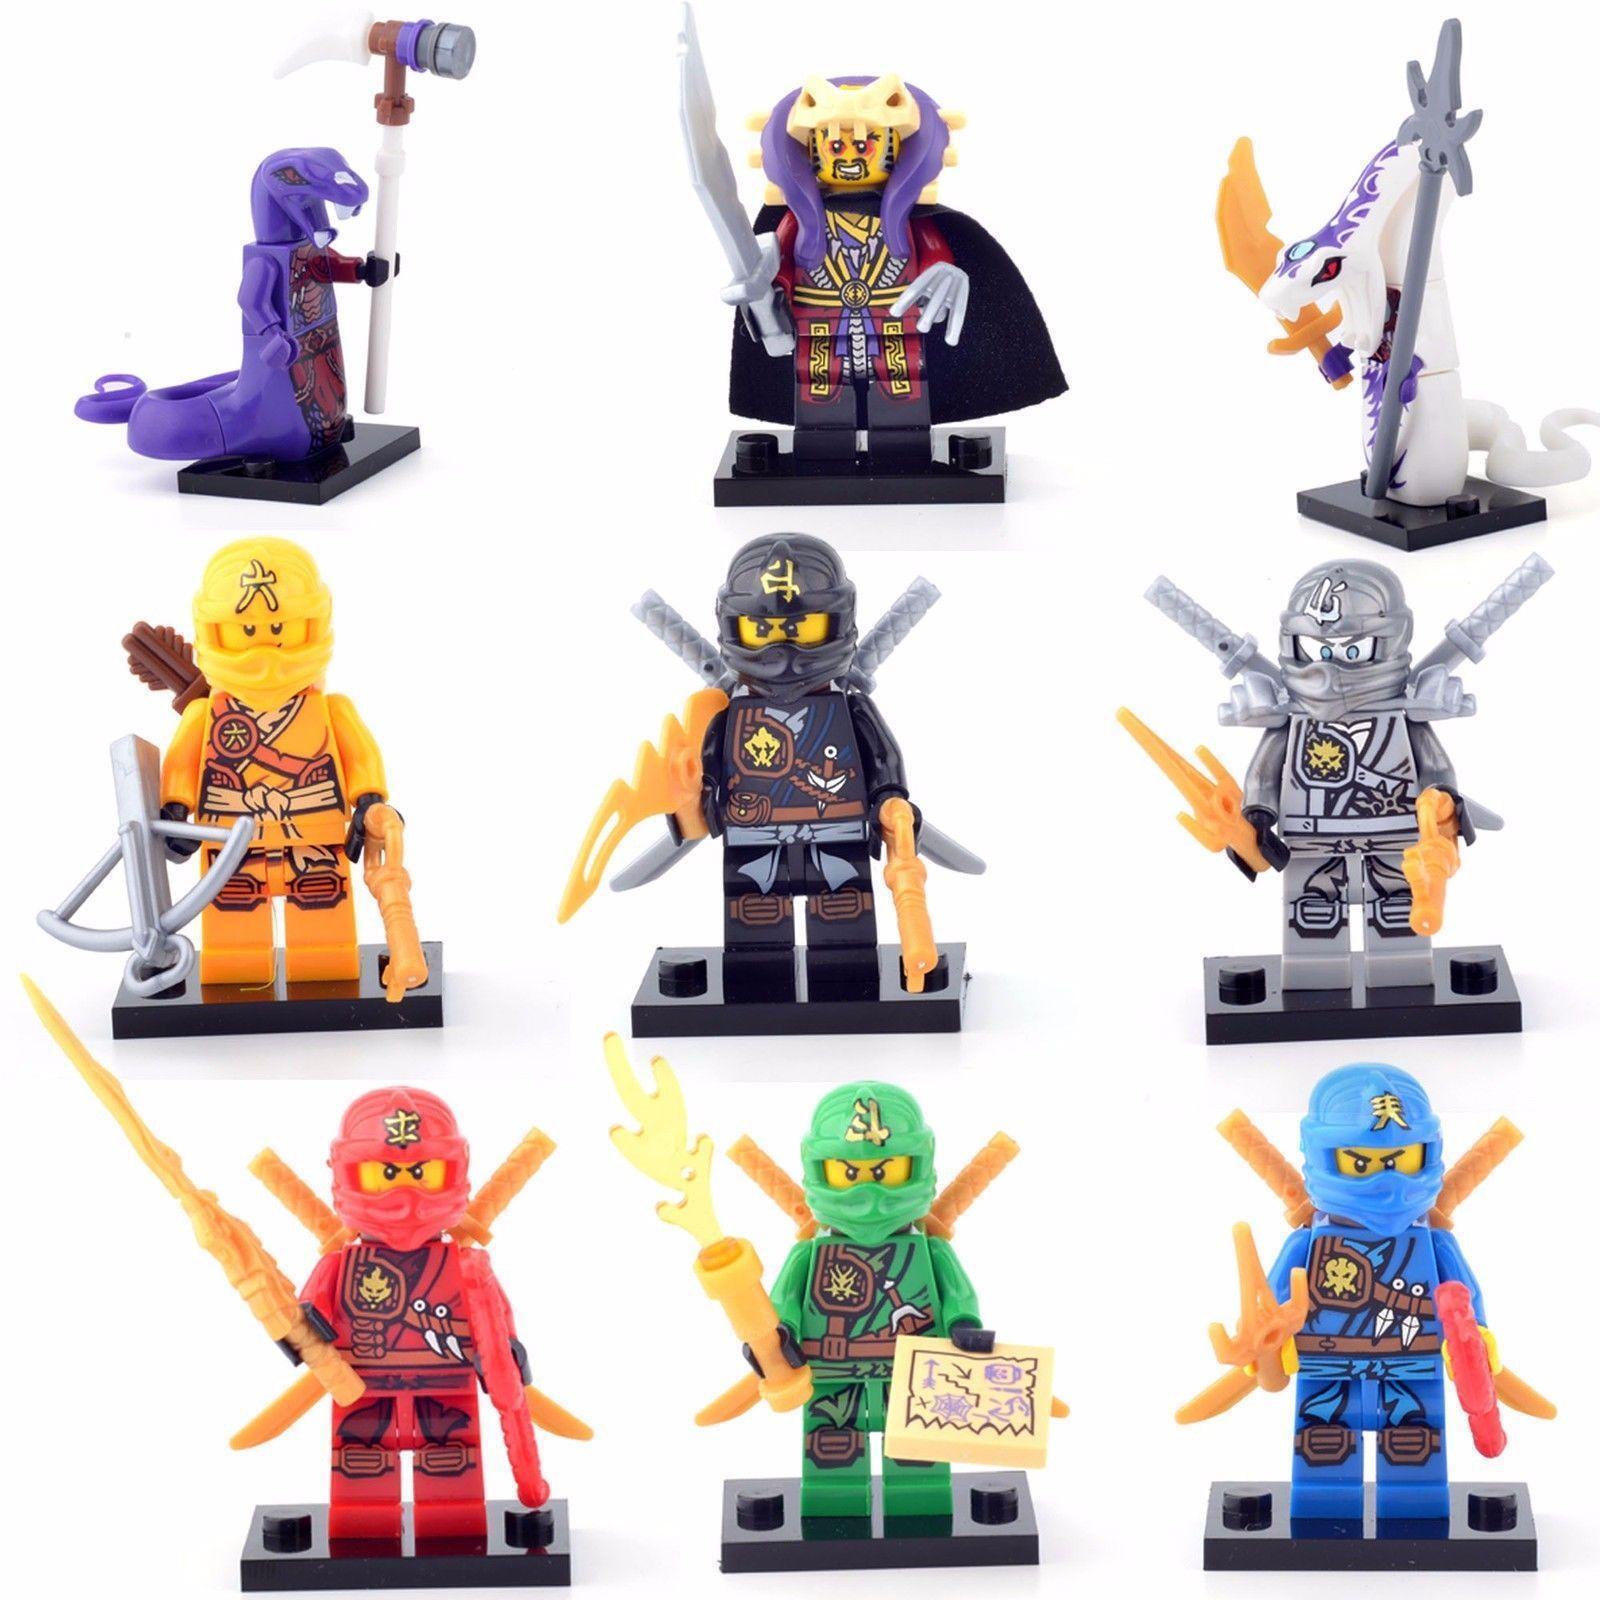 9 Sets Minifigures Toys Ninja Ninjago Lloyd Skylor Zane Cole Jay Kapau Fast Ship *Highly-Rated*